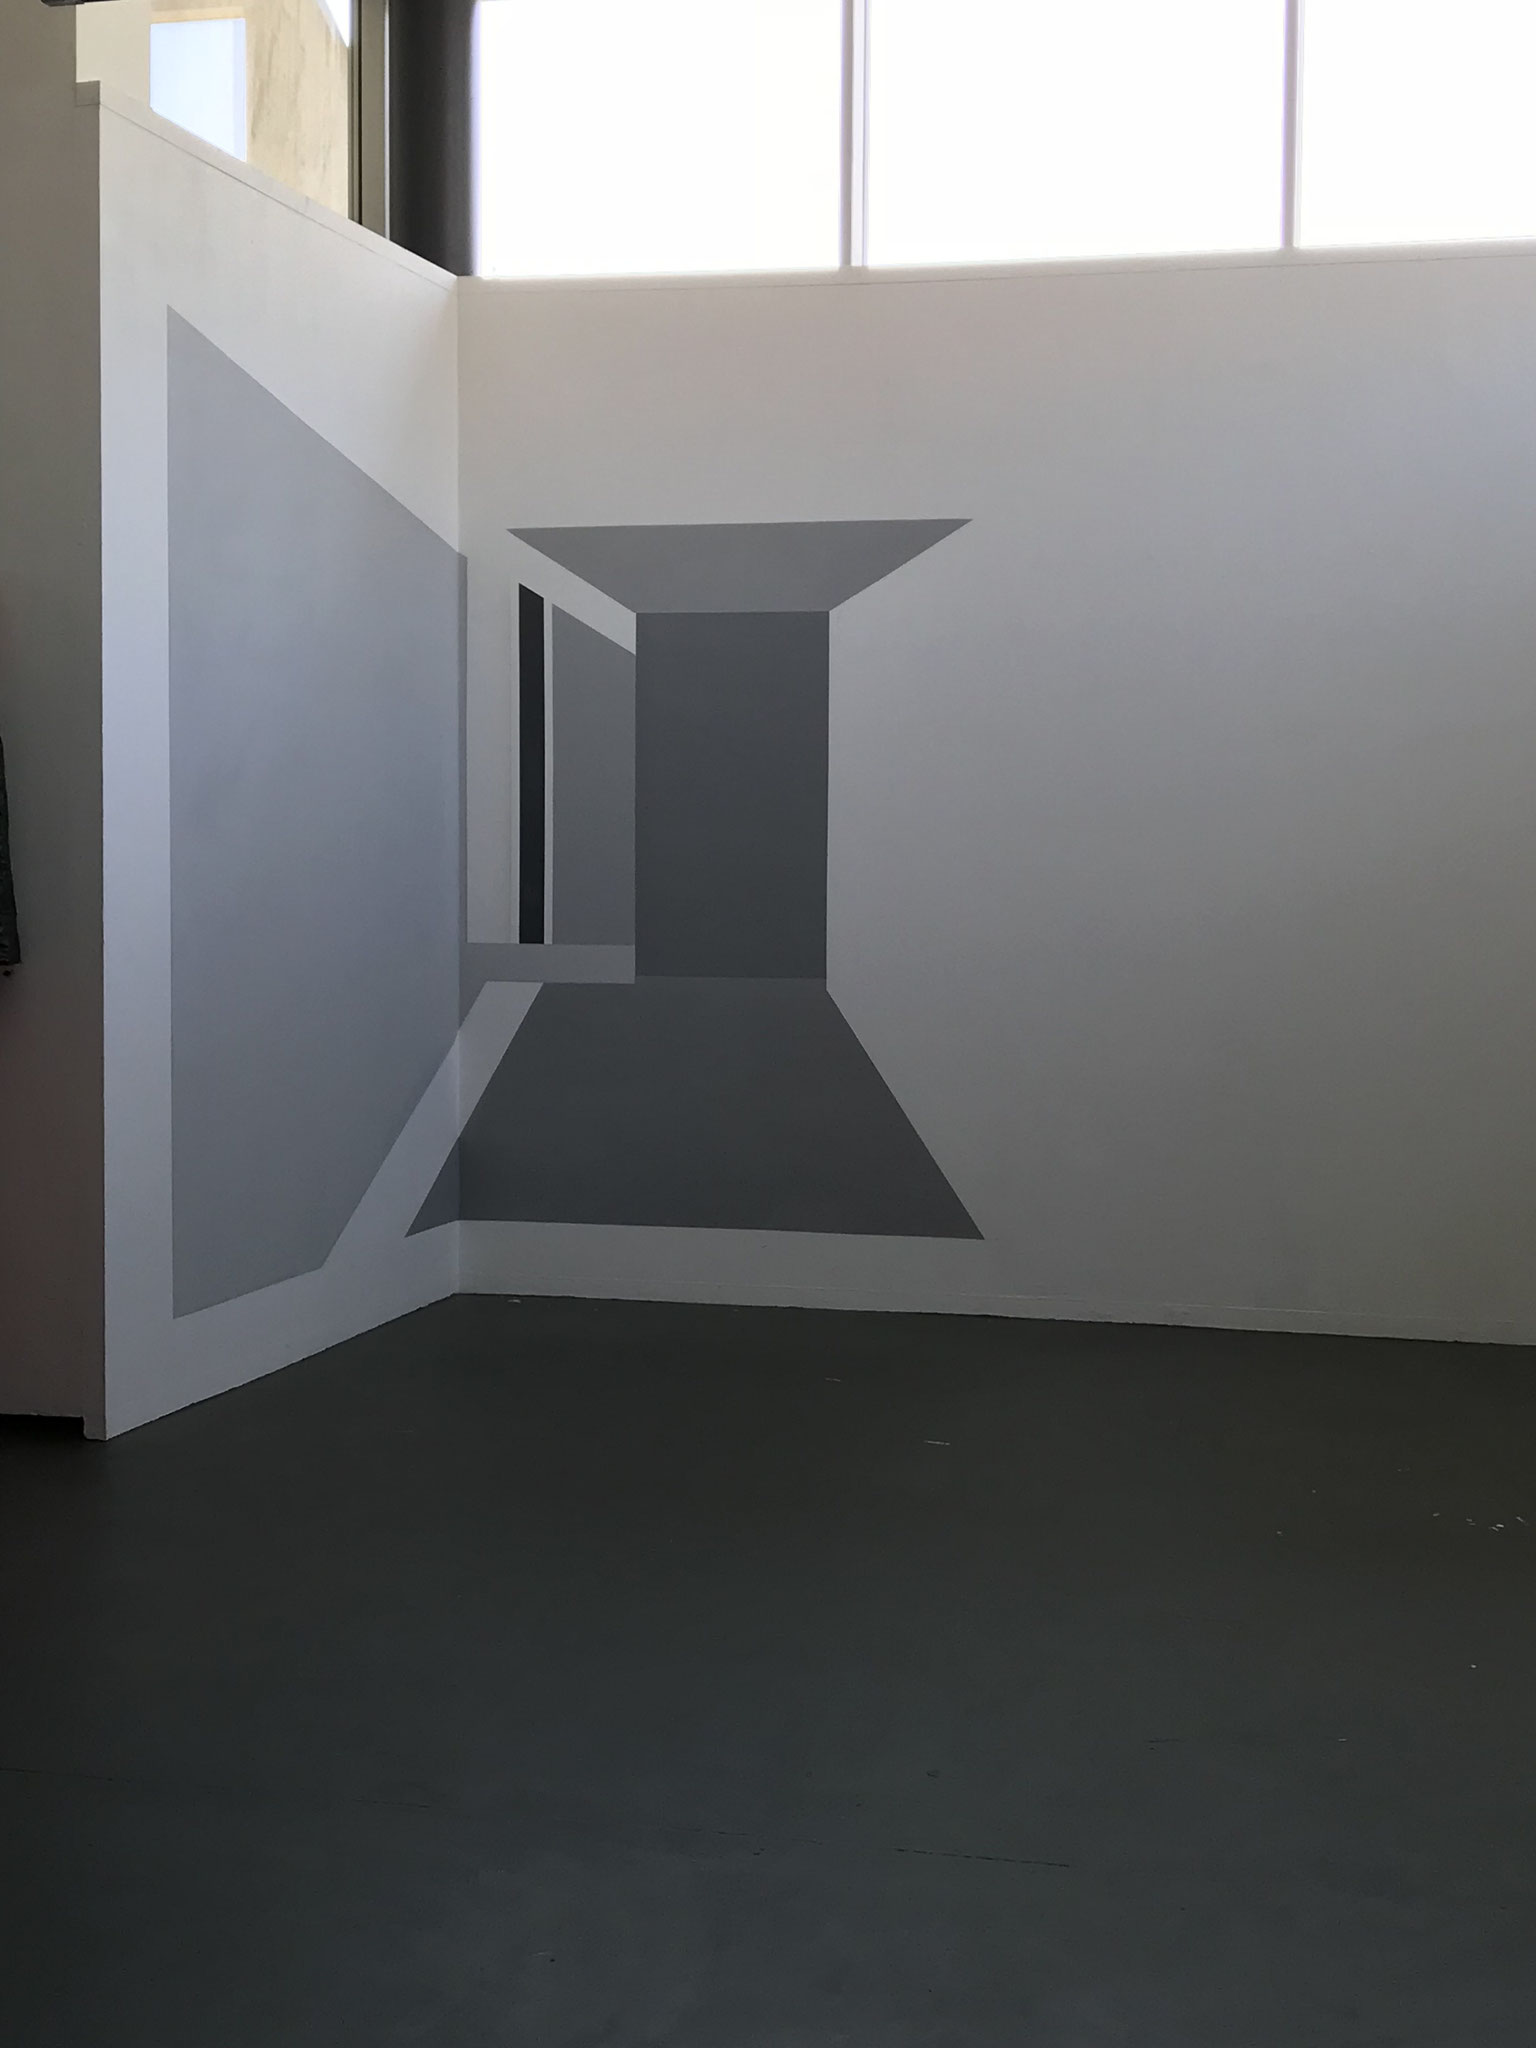 o.T., Wandfarbe/Acryl auf Putz, 280 x 500cm, 2018